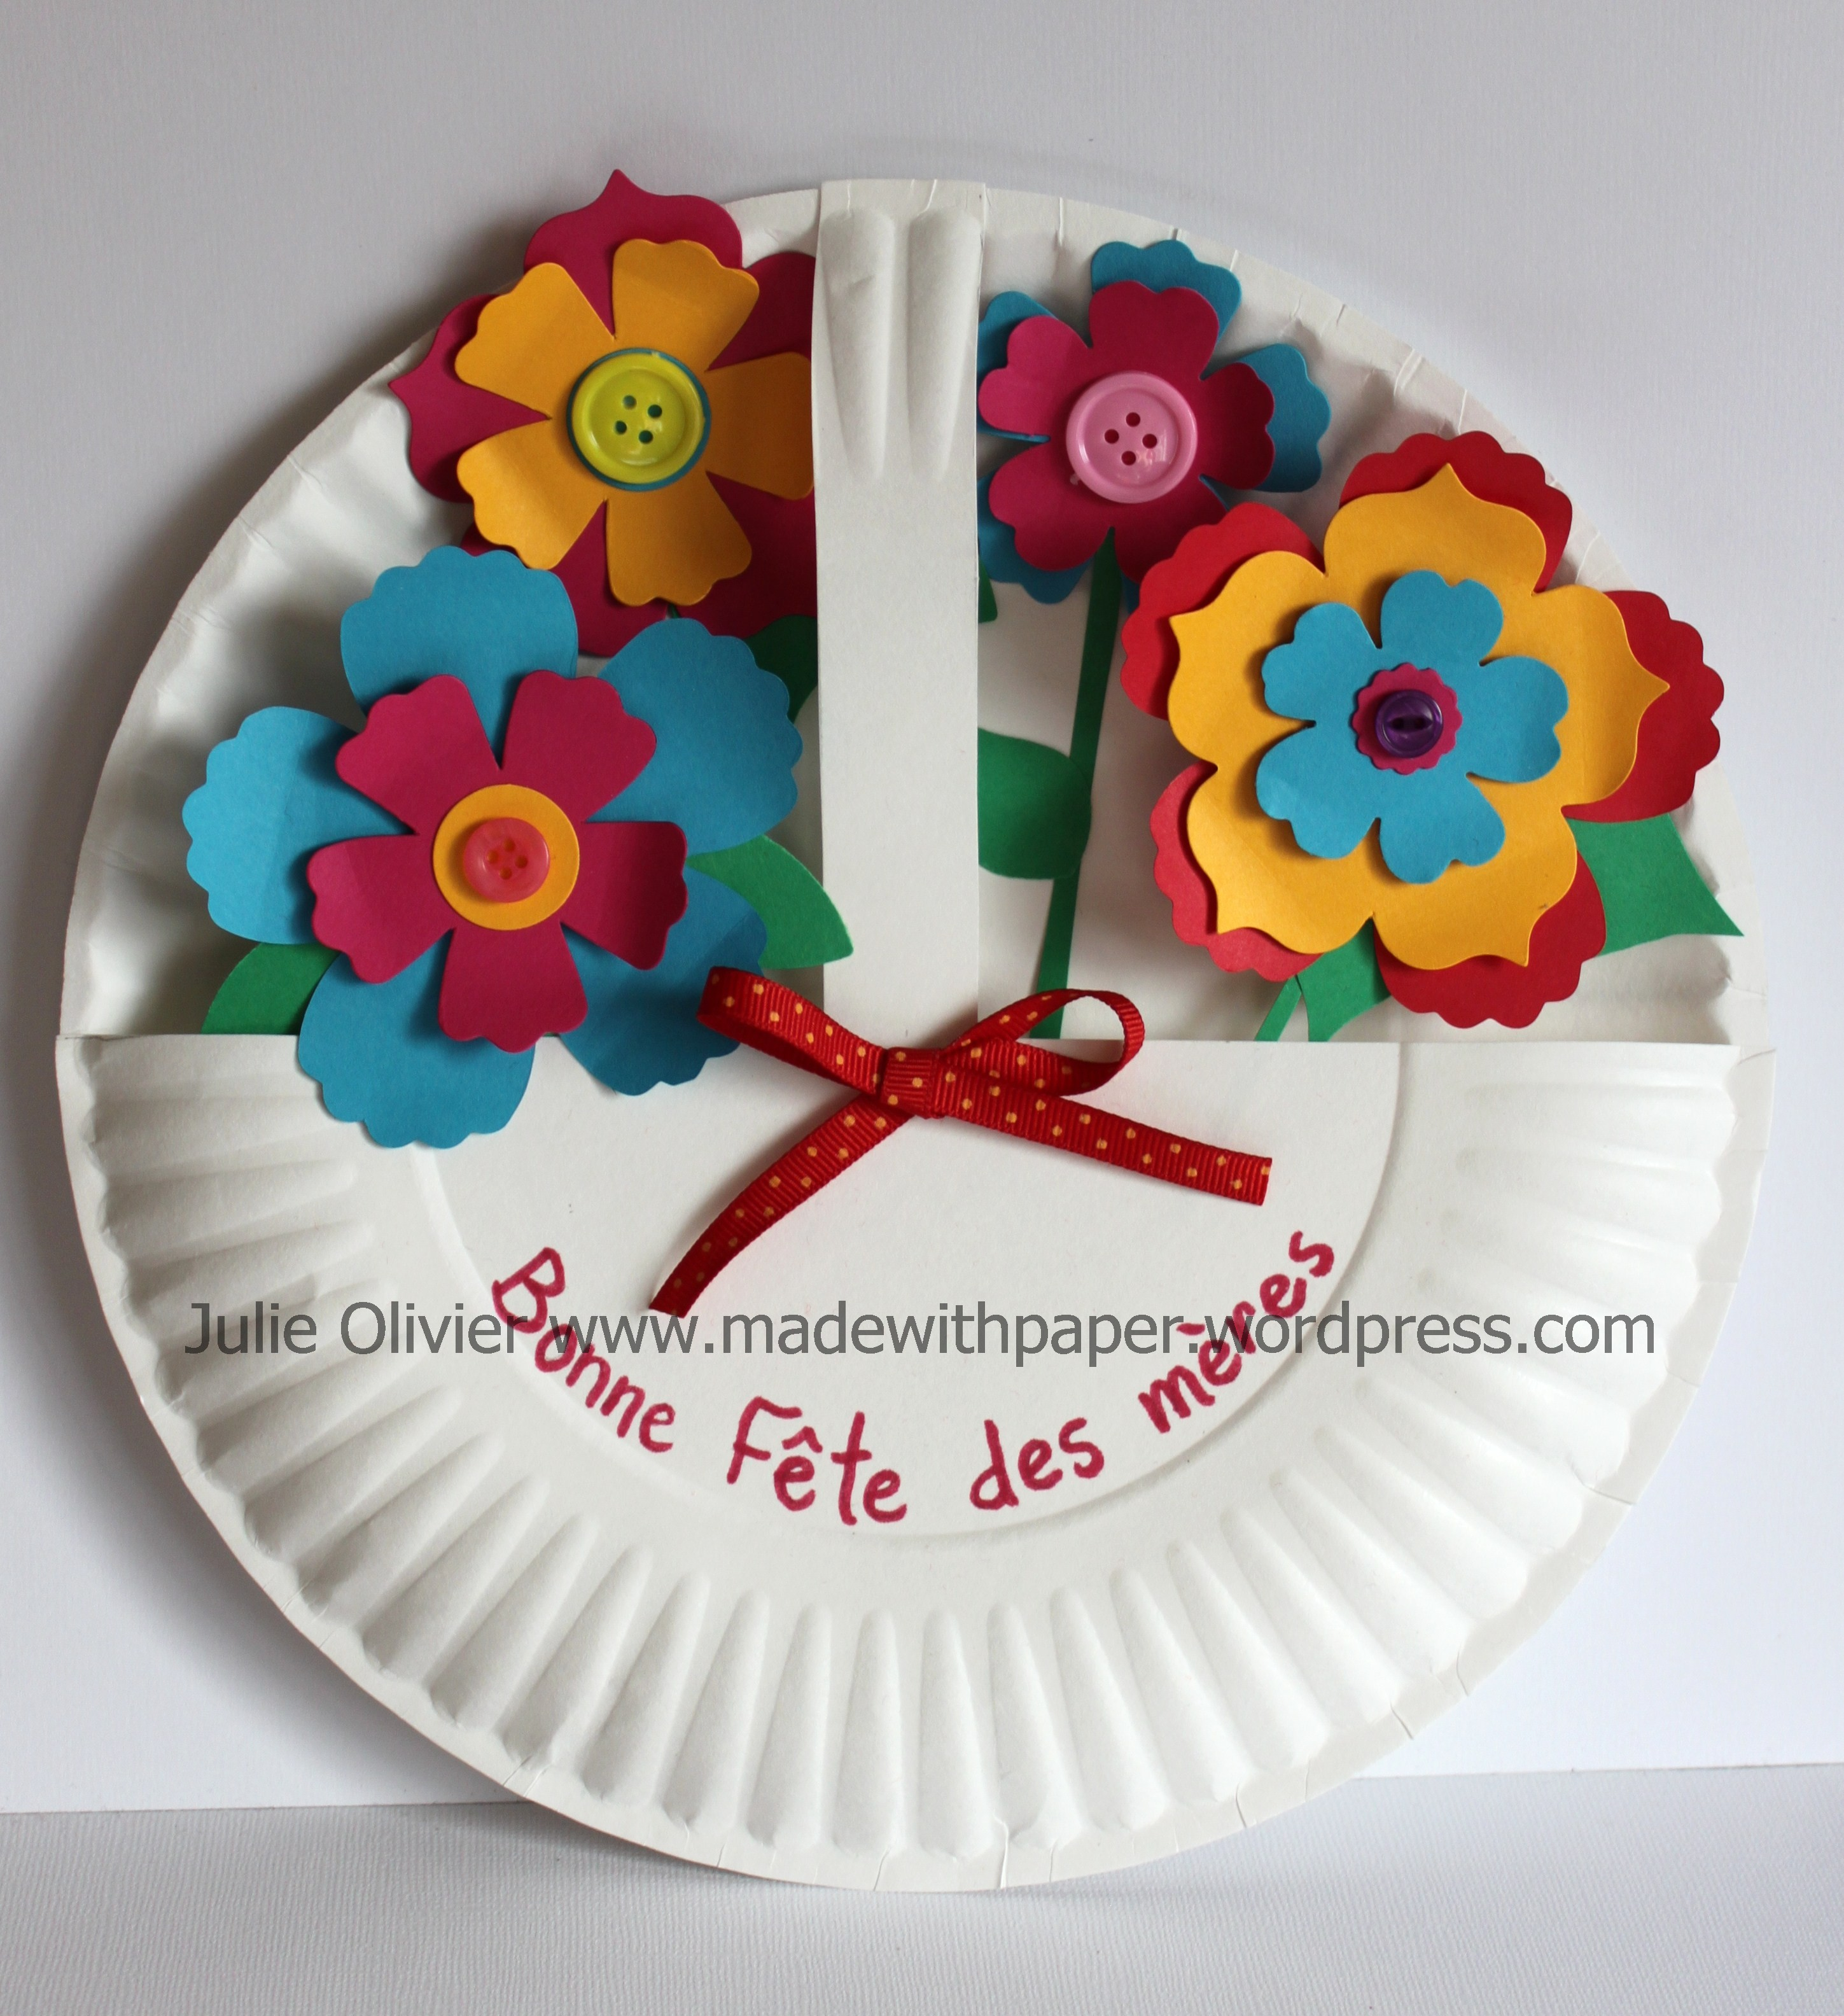 Flower Basket Craft Ideas  Flower crafts children and paper plate on  sc 1 st  usamsoc.com & Flower Basket Craft Ideas: Moved permanently. Craft paper basket ...